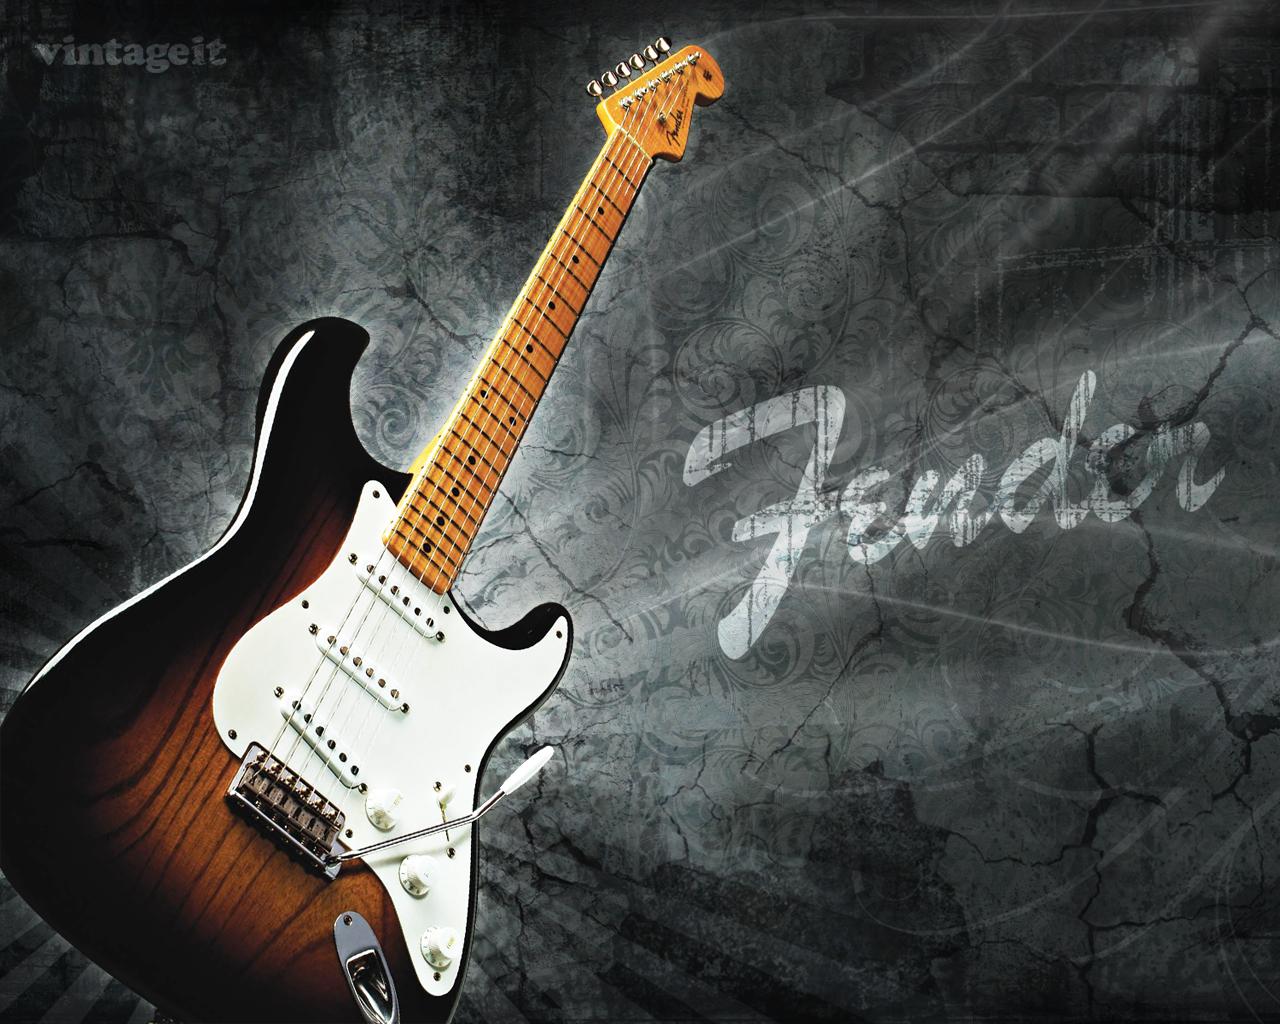 Fender Stratocaster wallpaper   Desktop HD iPad iPhone wallpapers 1280x1024